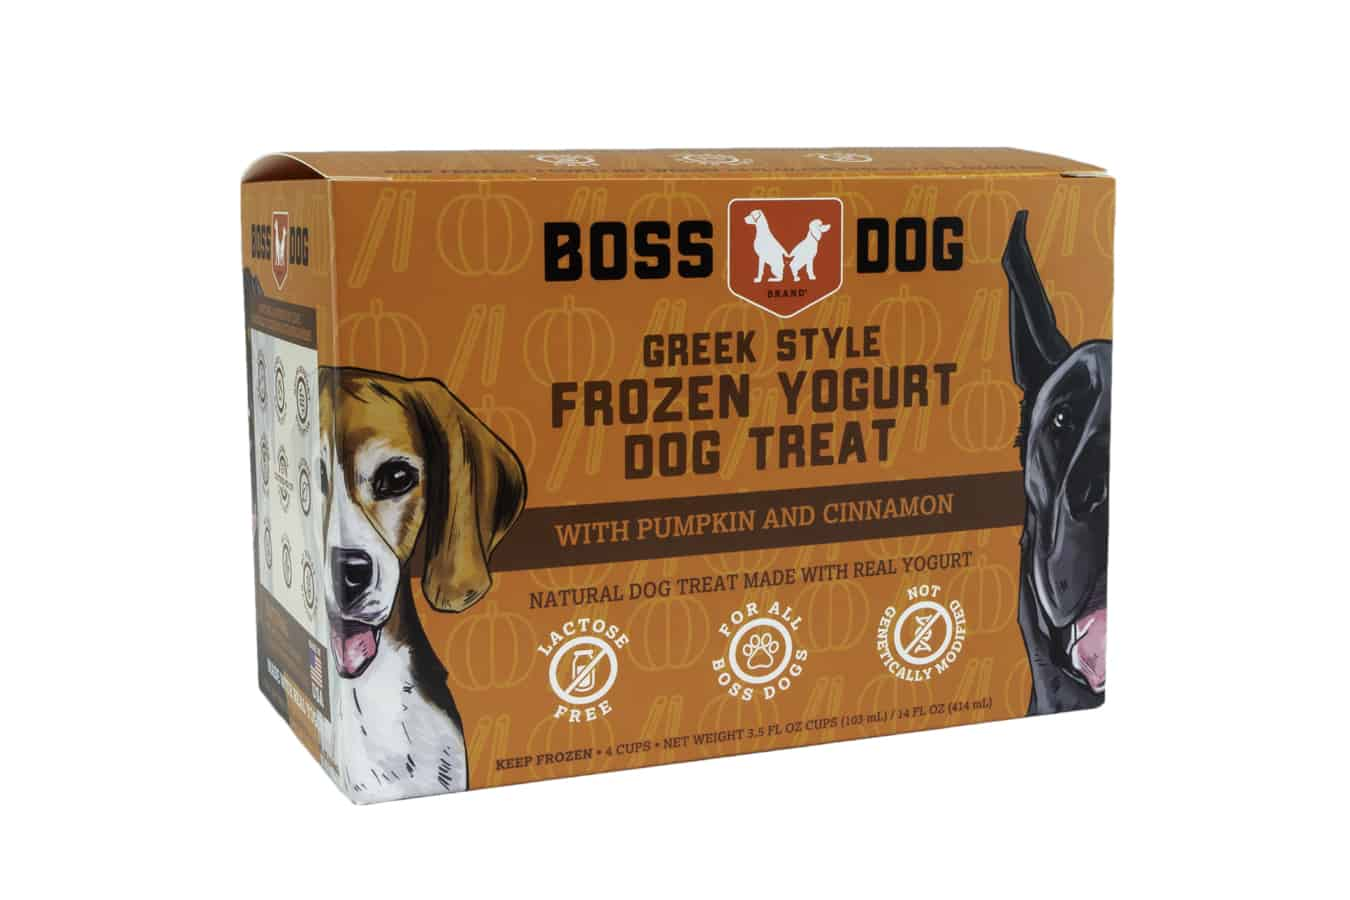 Boss Dog Pumpkin & Cinnamon Frozen Yogurt Dog Treats, 3.5-oz, 4-pack Size: 3.5-oz, 4-pack